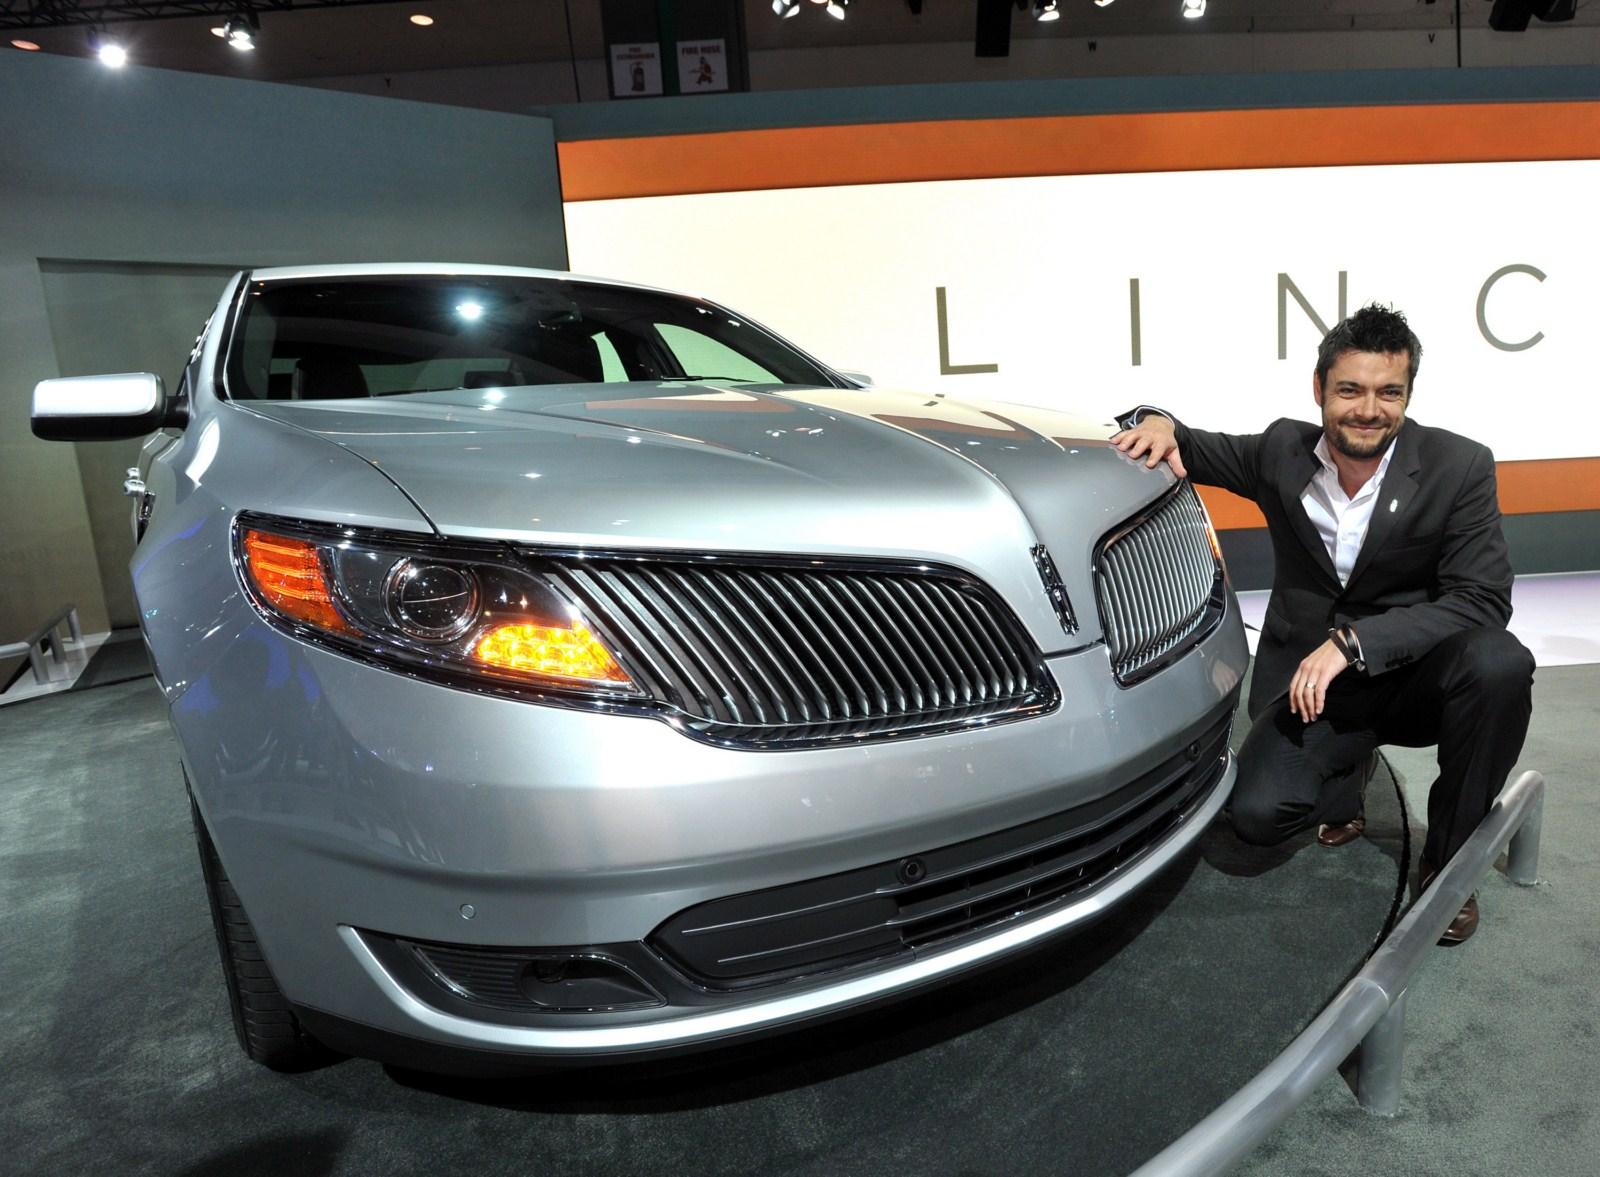 Lincoln Mks Livery Autoblog Gr